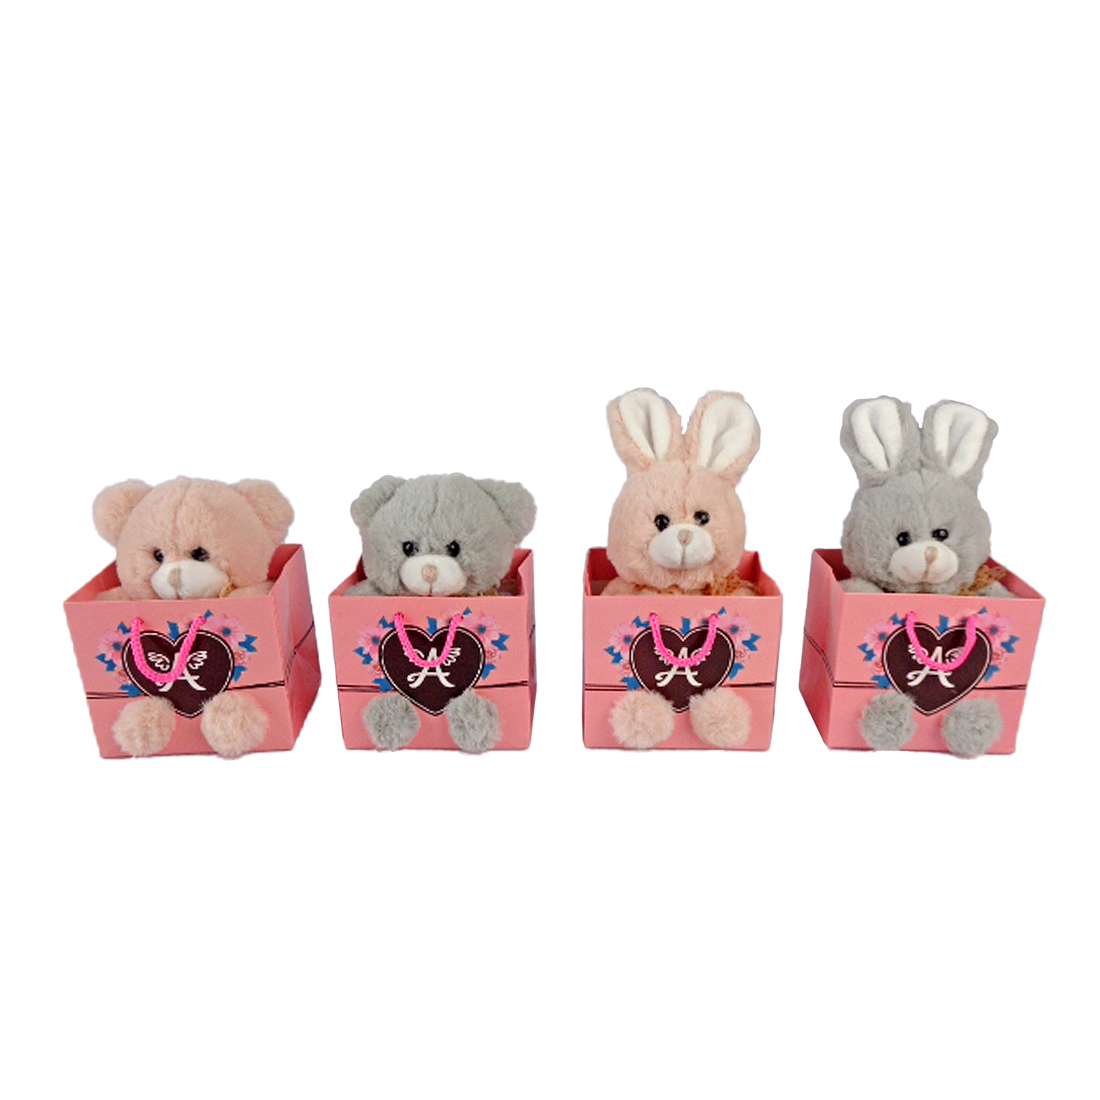 Мягкие игрушки Angel Collection Мягкая игрушка Angel Collection «Валентинка» в асс. angel omnibus